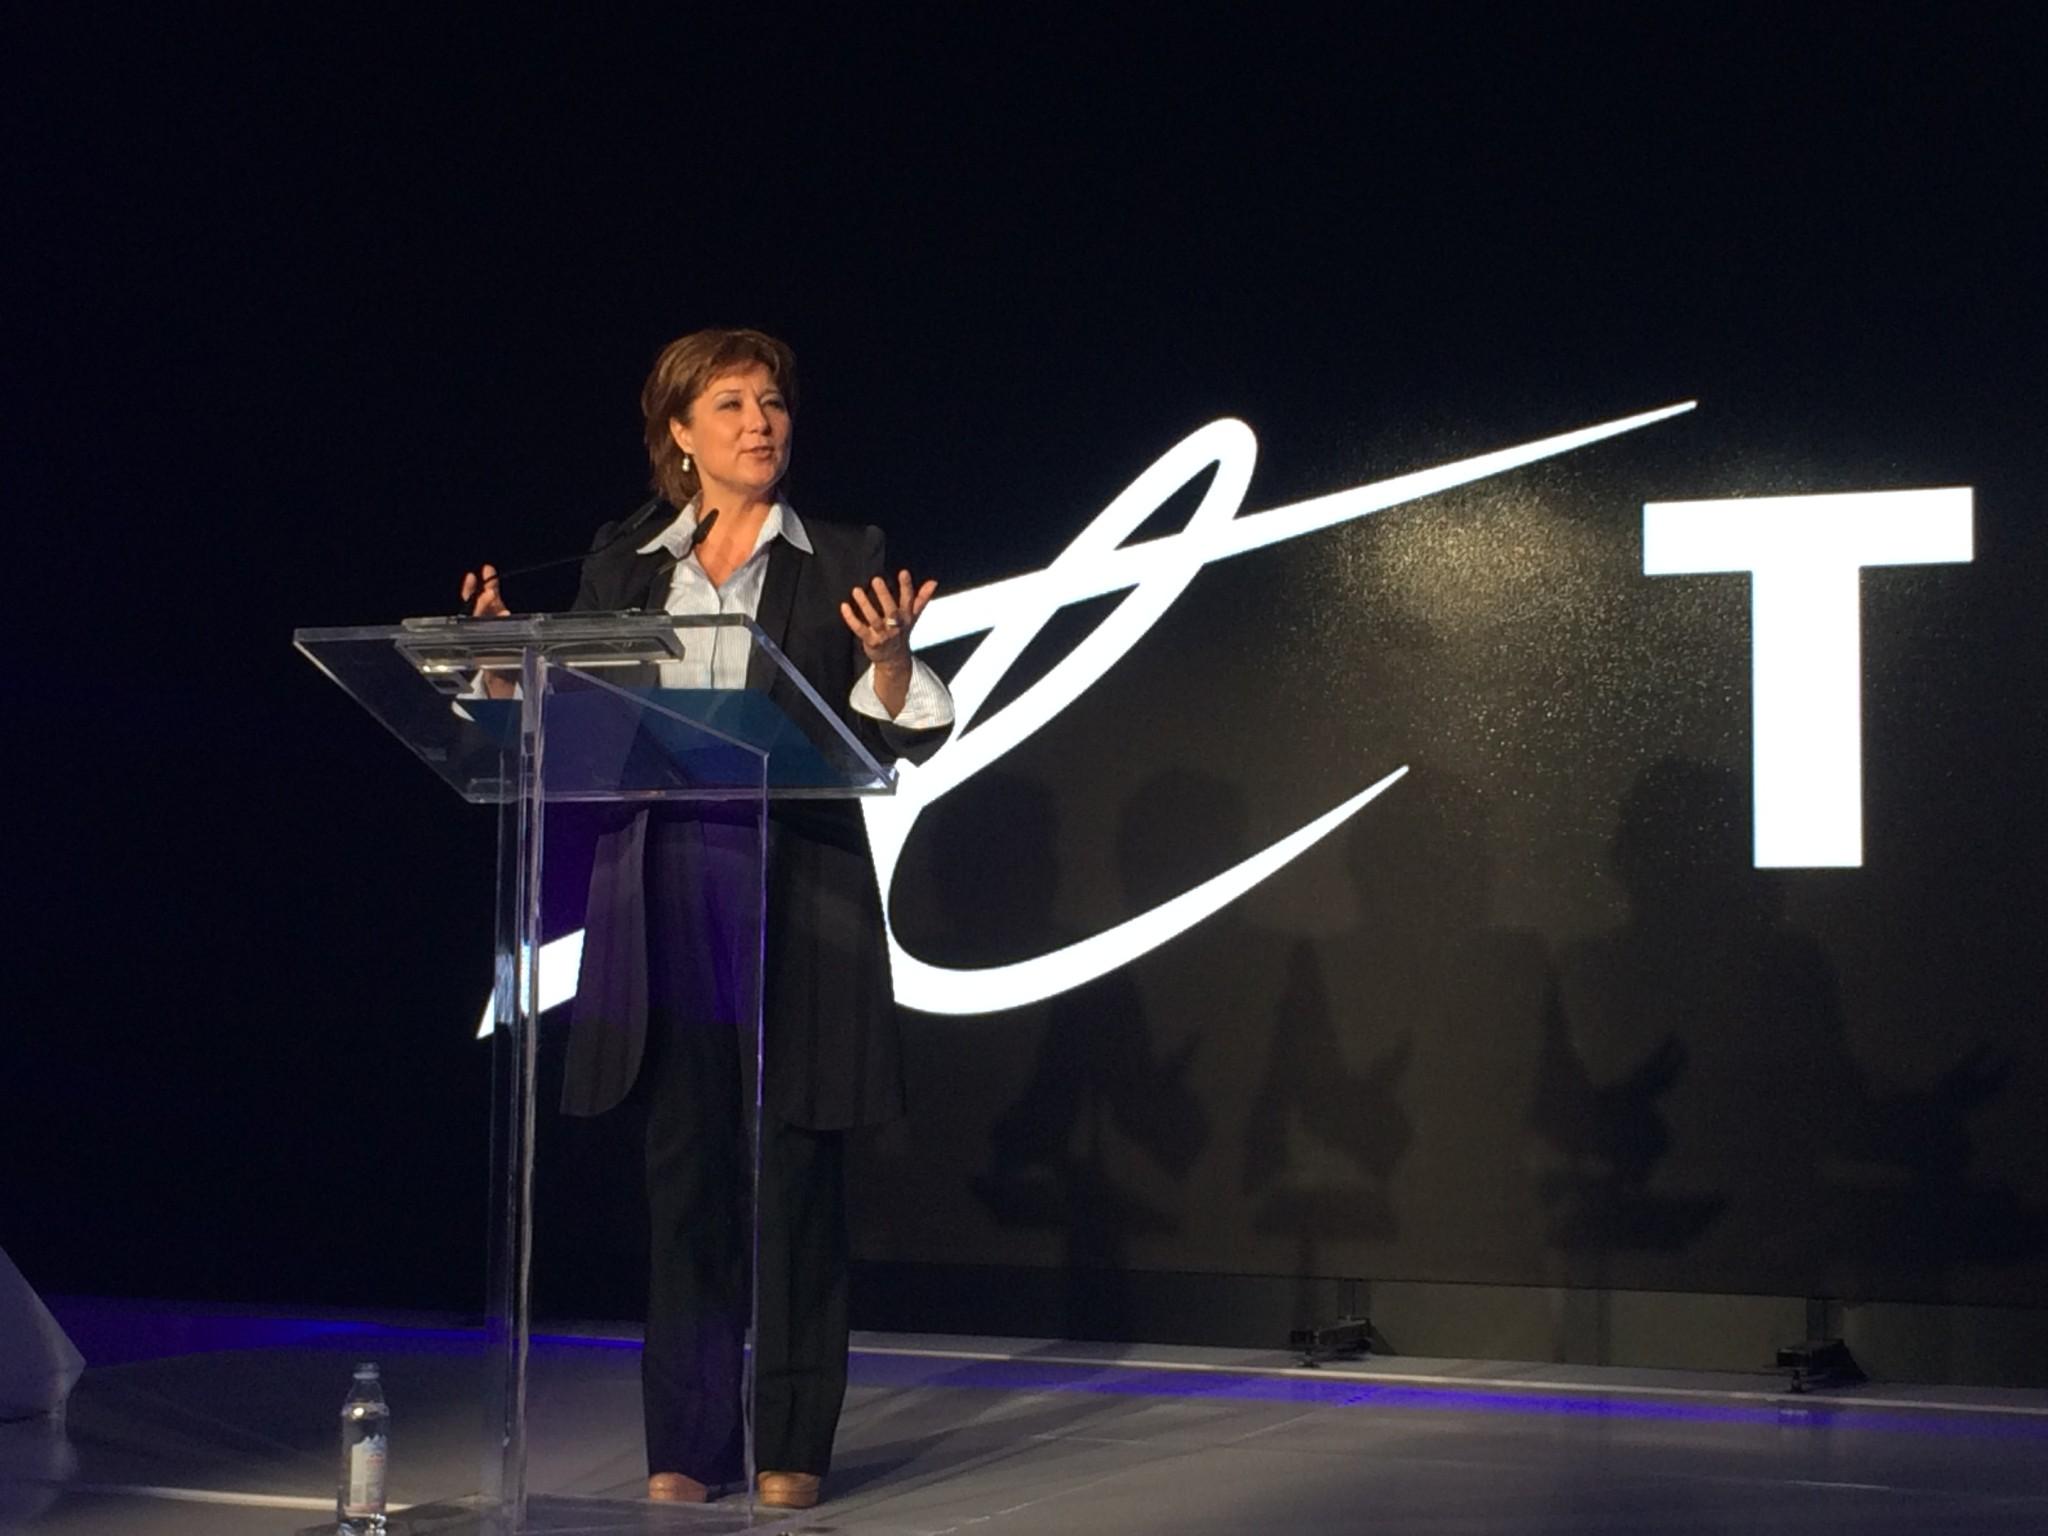 Christy Clark speaks at TELUS' October 2 Fibre Optic announcment; Image: Jill Slattery / Vancity Buzz